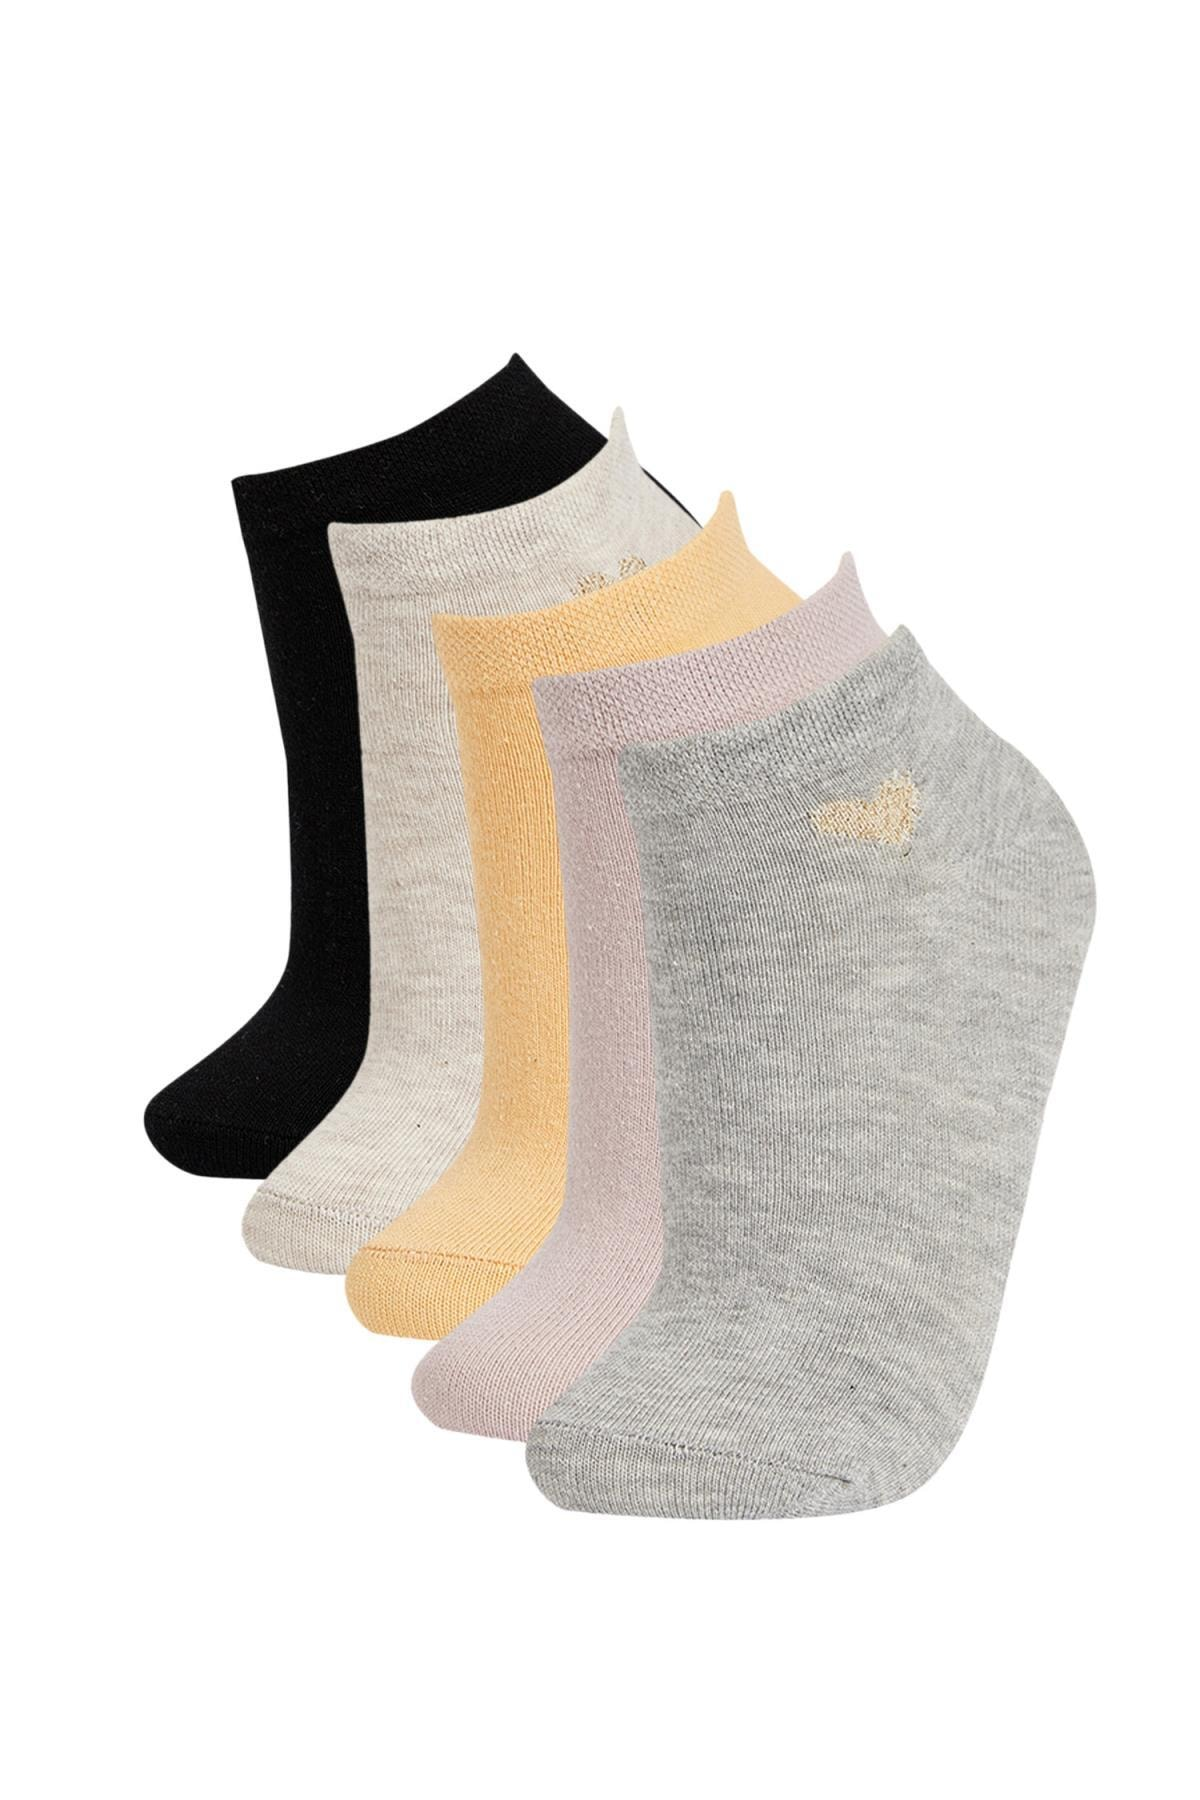 DeFacto Kadın Çok Renkli Desenli 5'Li Patik Çorap V5122AZ21AUKR